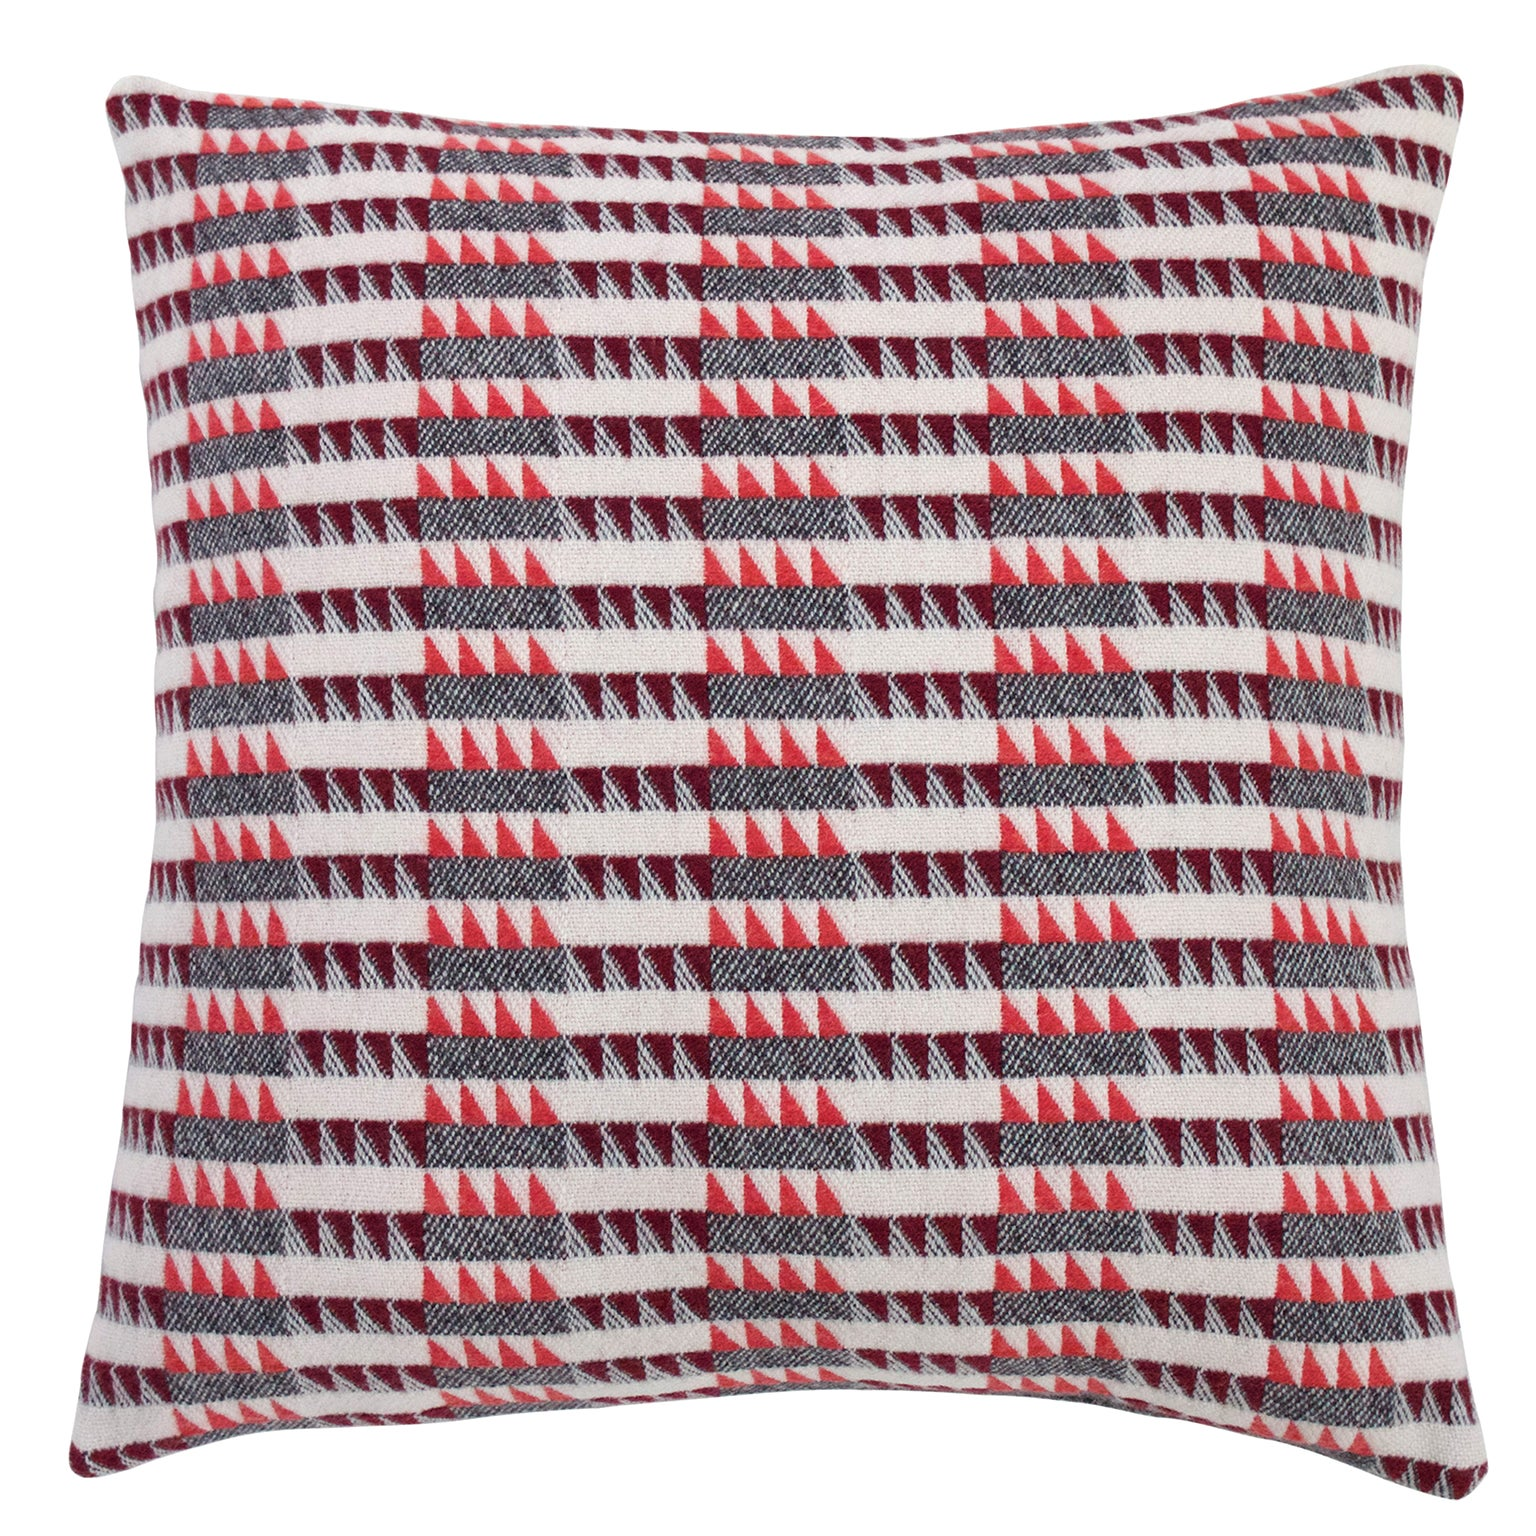 Handwoven 'Ixelles' Geometric Merino Wool Cushion Pillow, Papaya/Burgundy/Grey